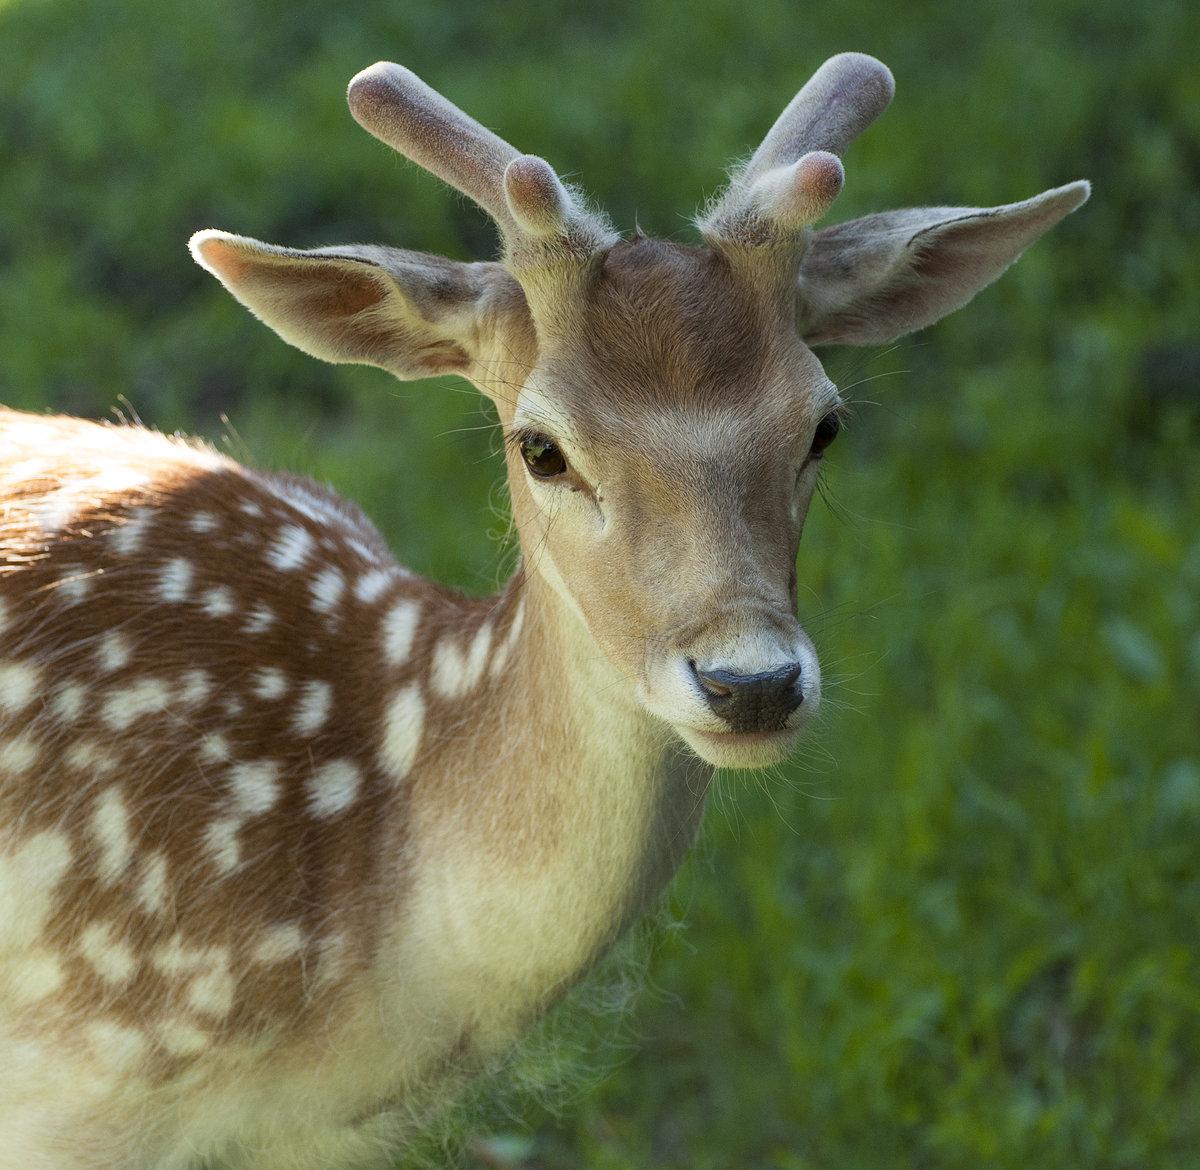 территории картинки животных лань хопкинс джоди